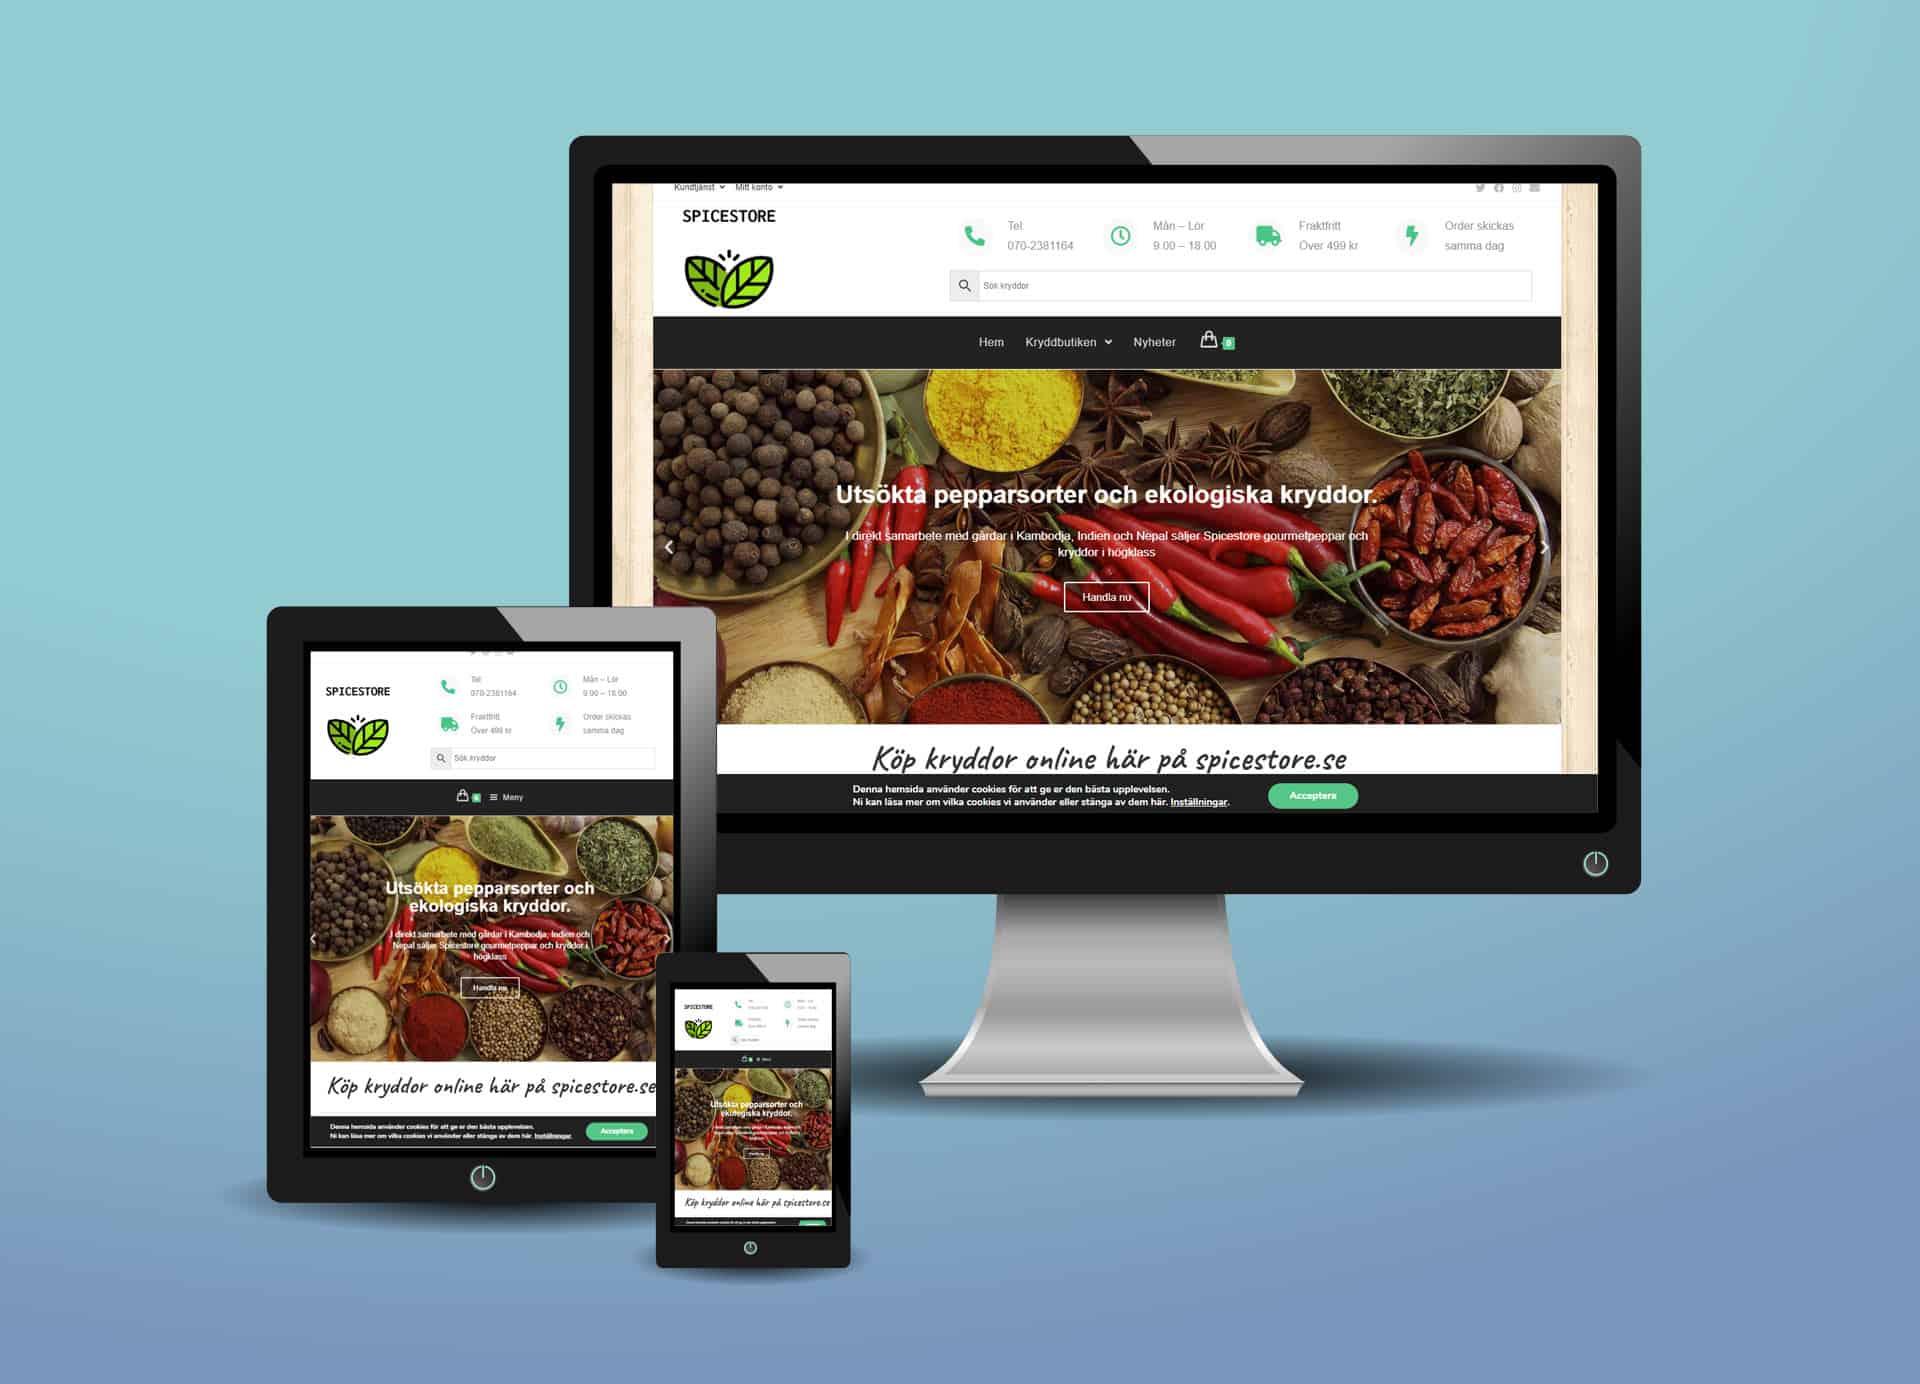 webshop till spicestore